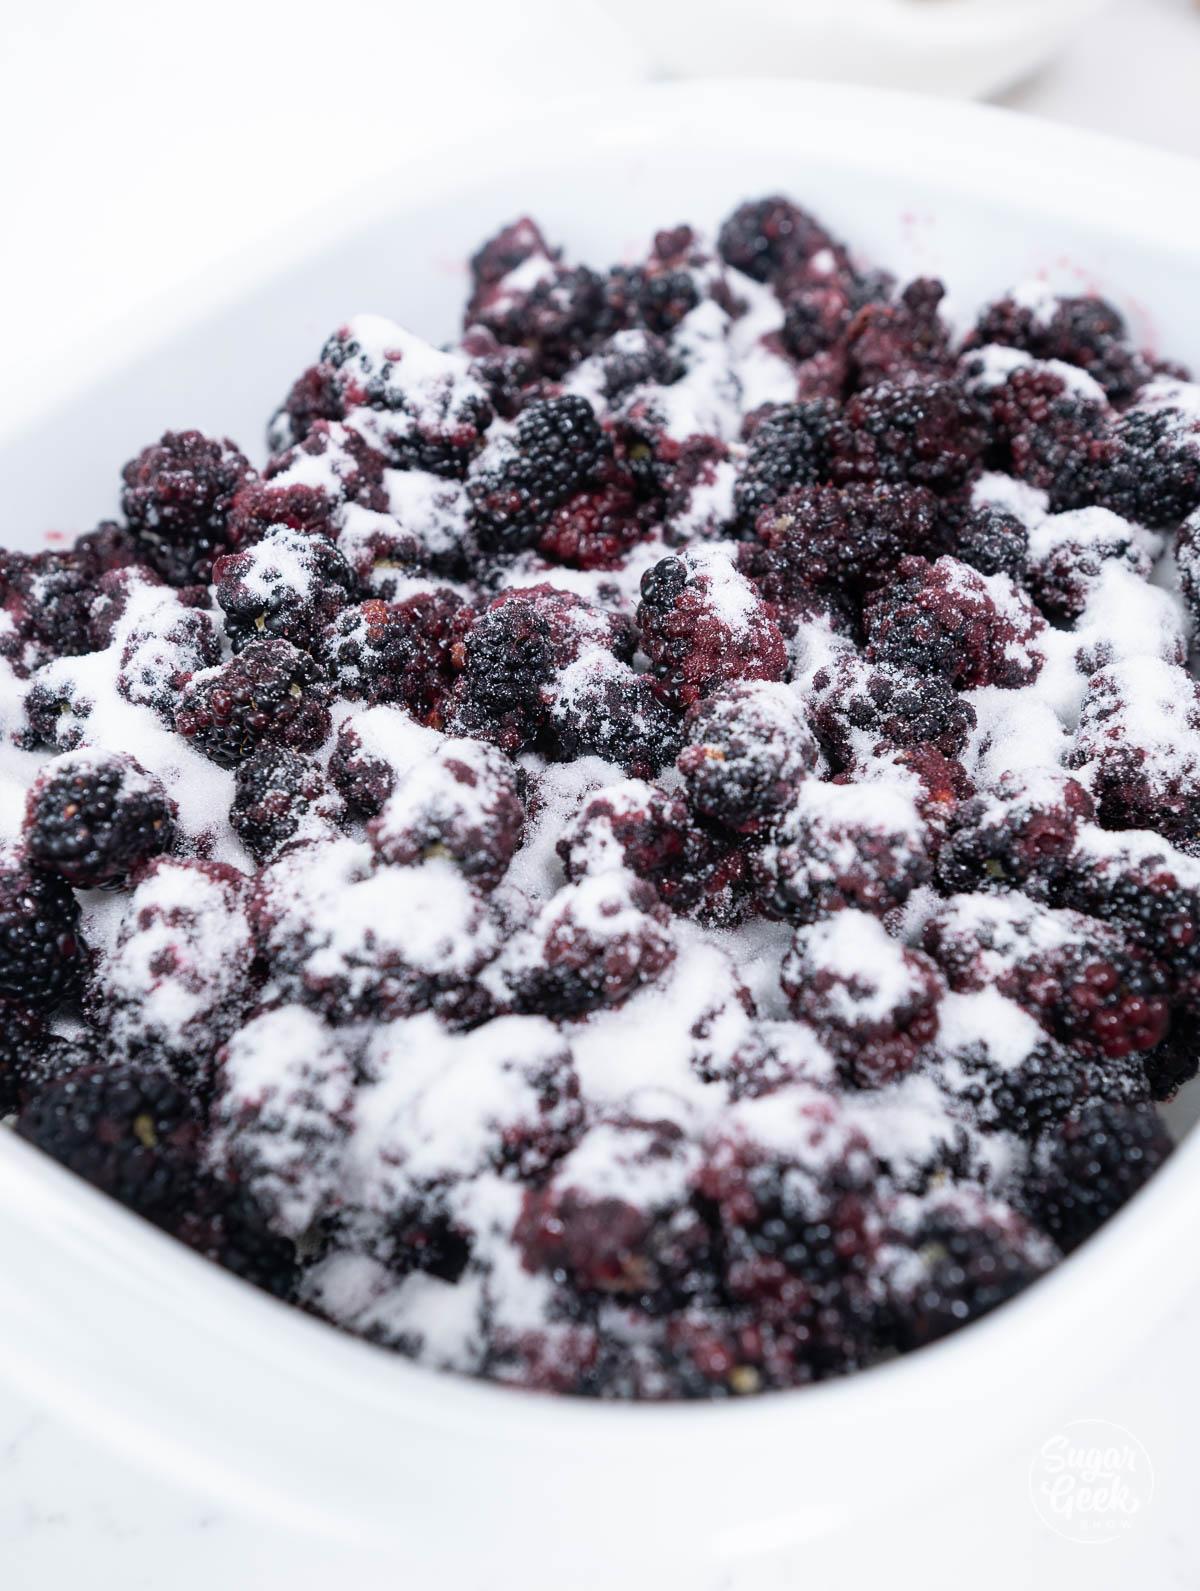 sugar sprinkled over blackberries in a white baking dish